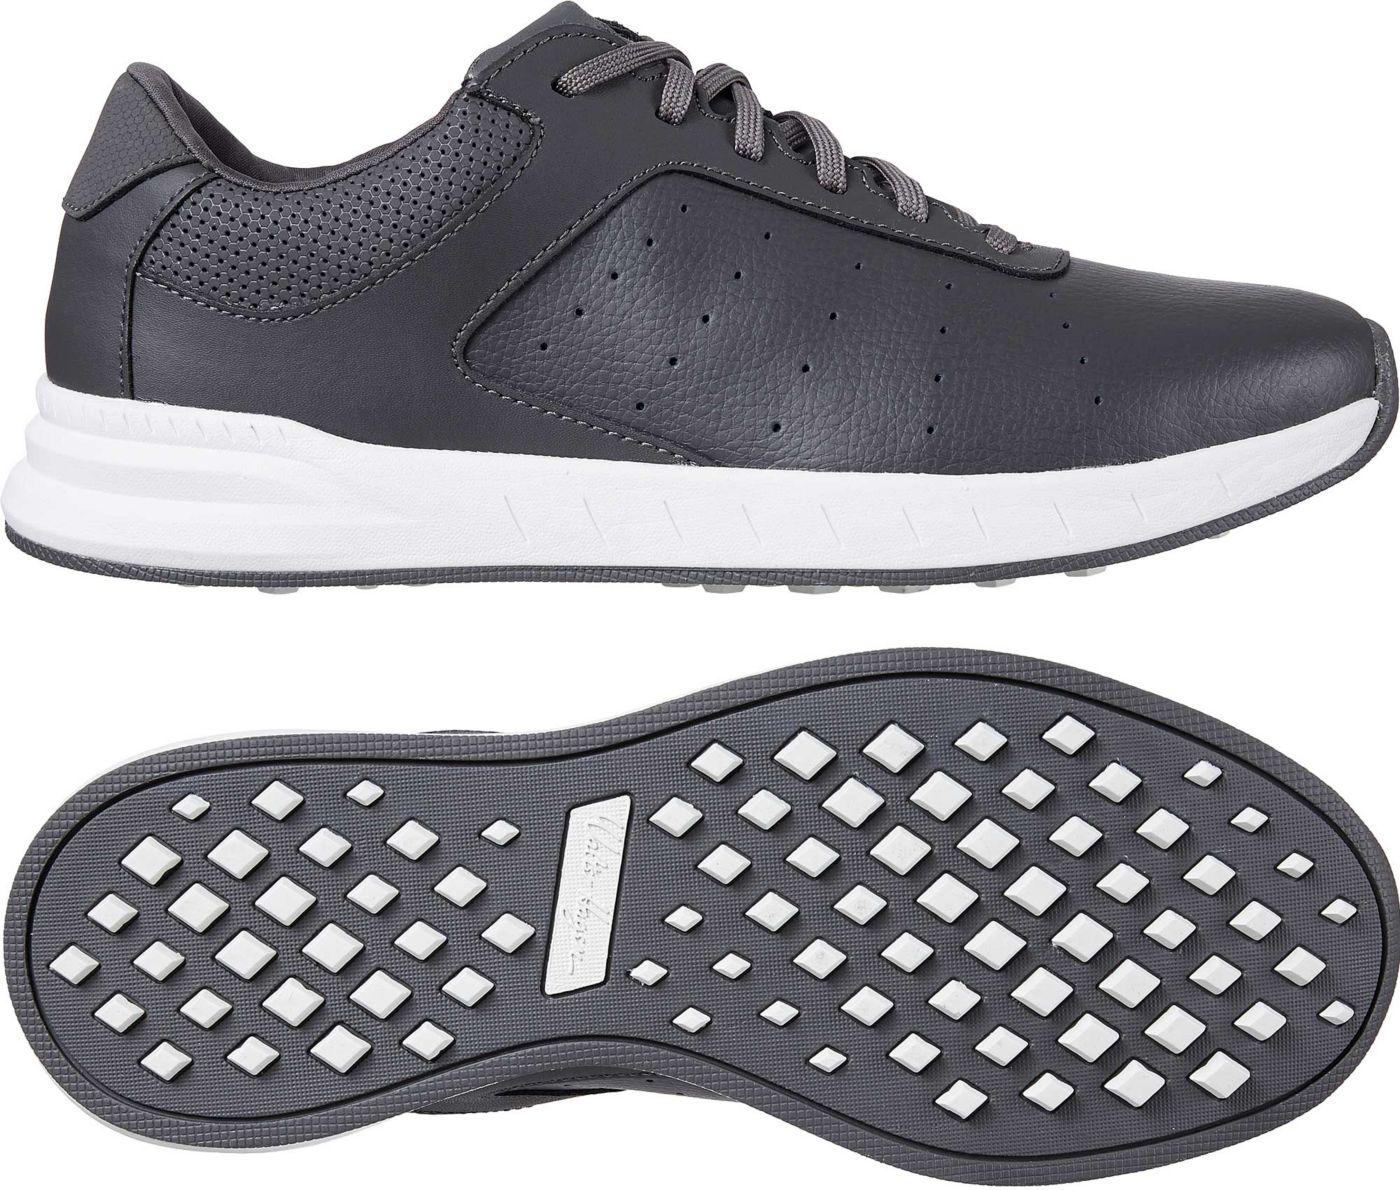 Walter Hagen Men's Course Casual Golf Shoes